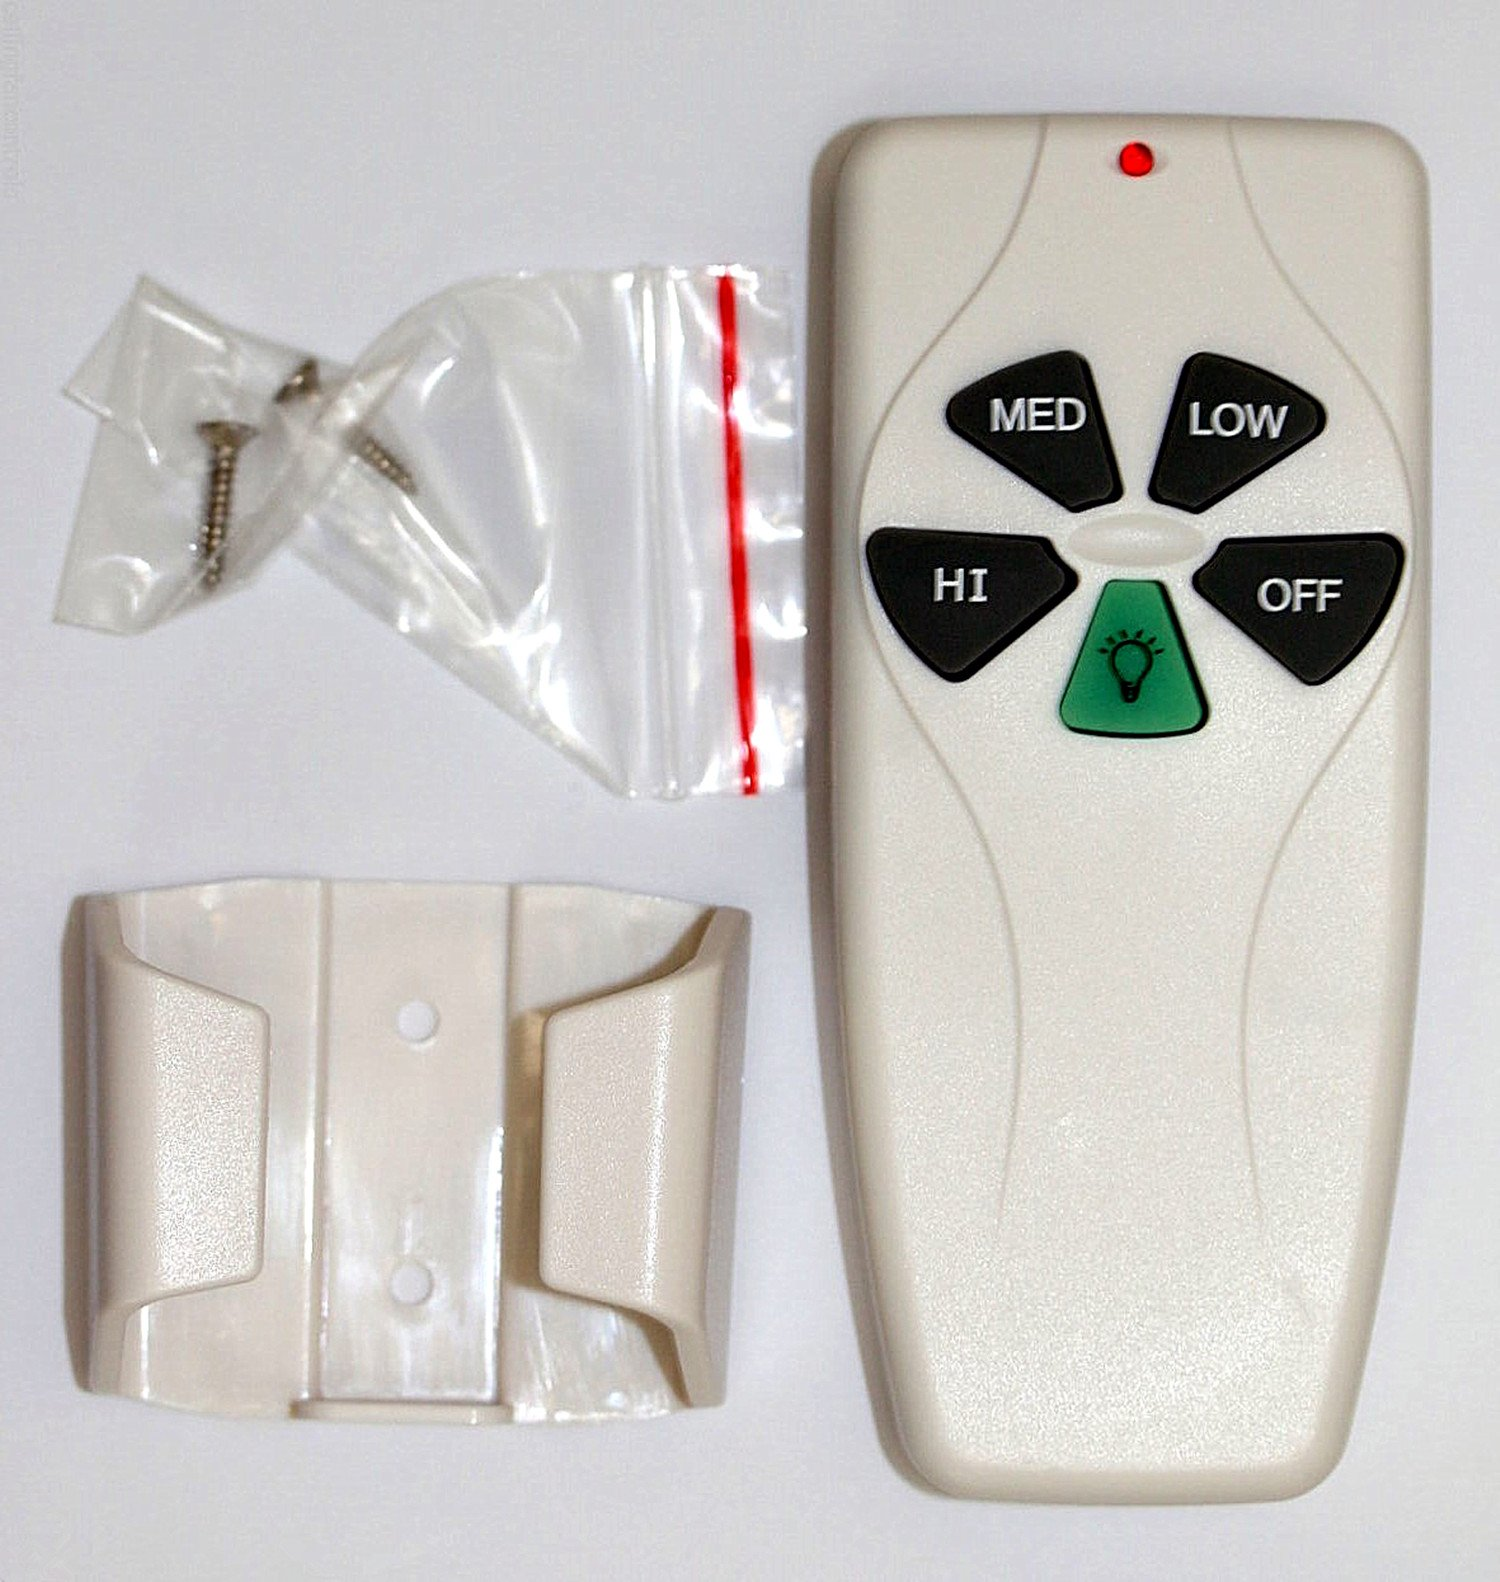 Protac For Ceiling Fan Wireless Remote Control Model CHQ8BT7030T CHQ7030T 1 Year Warranty